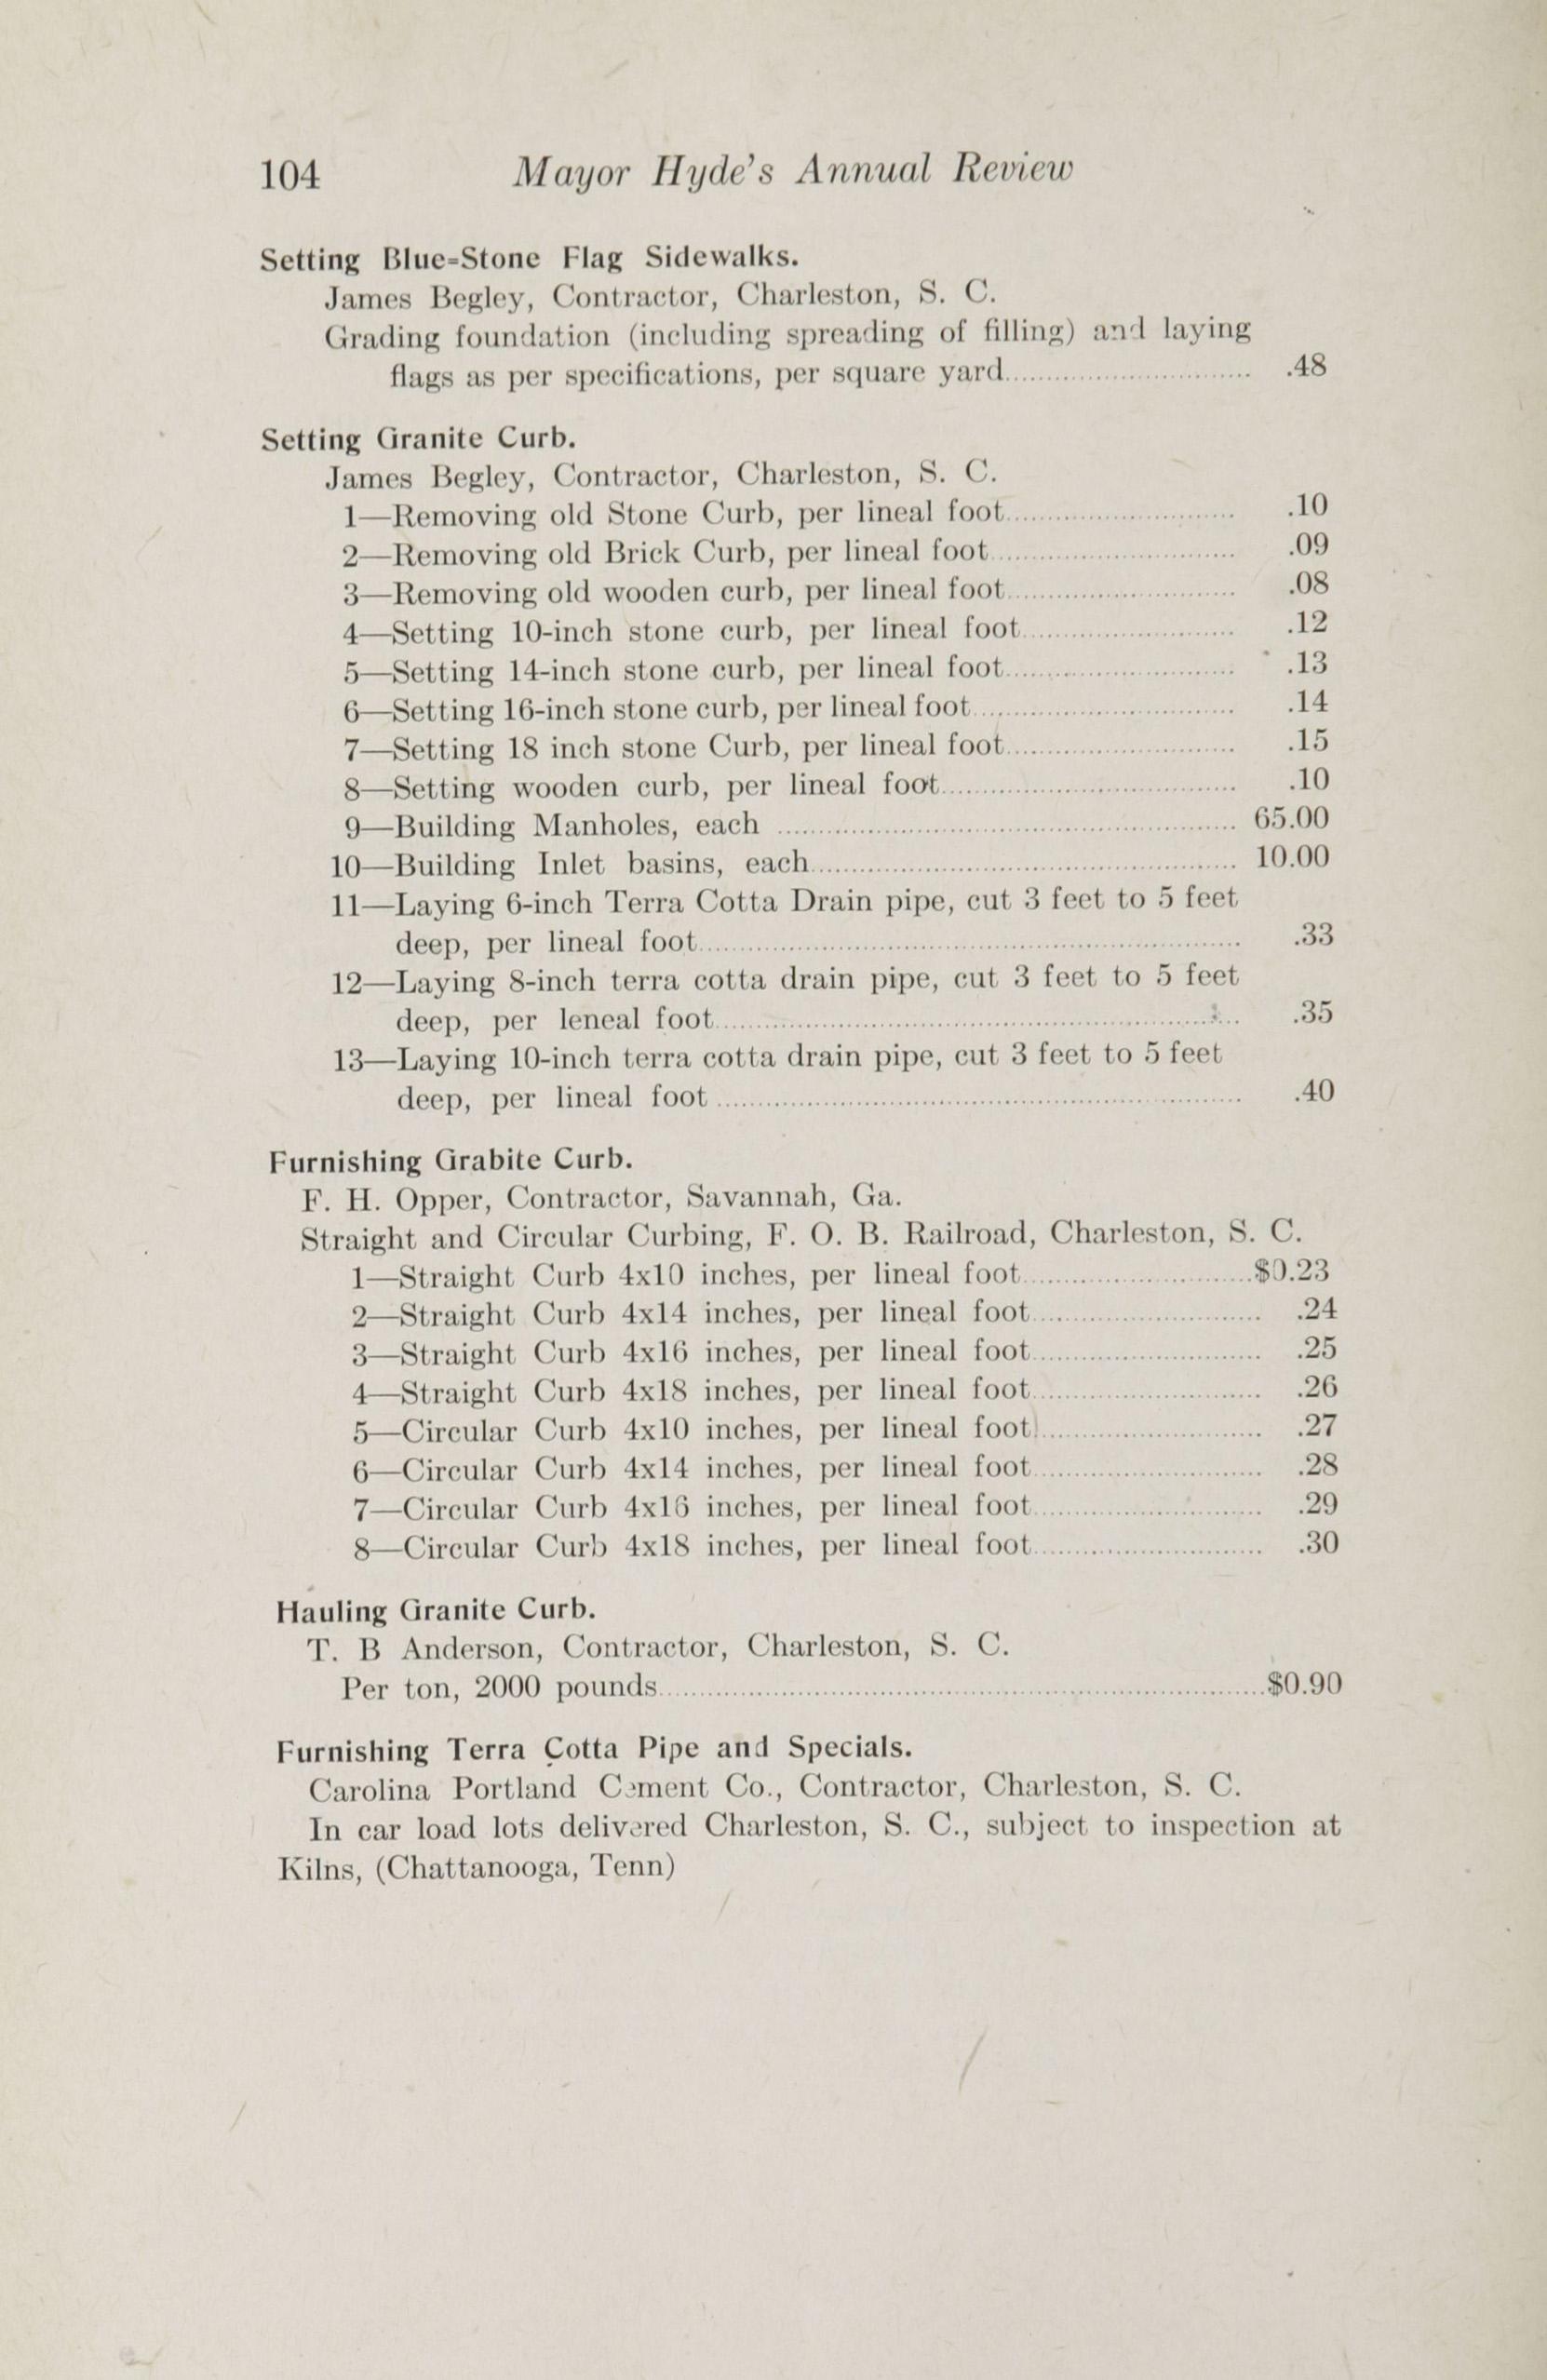 Charleston Yearbook, 1918, page 104